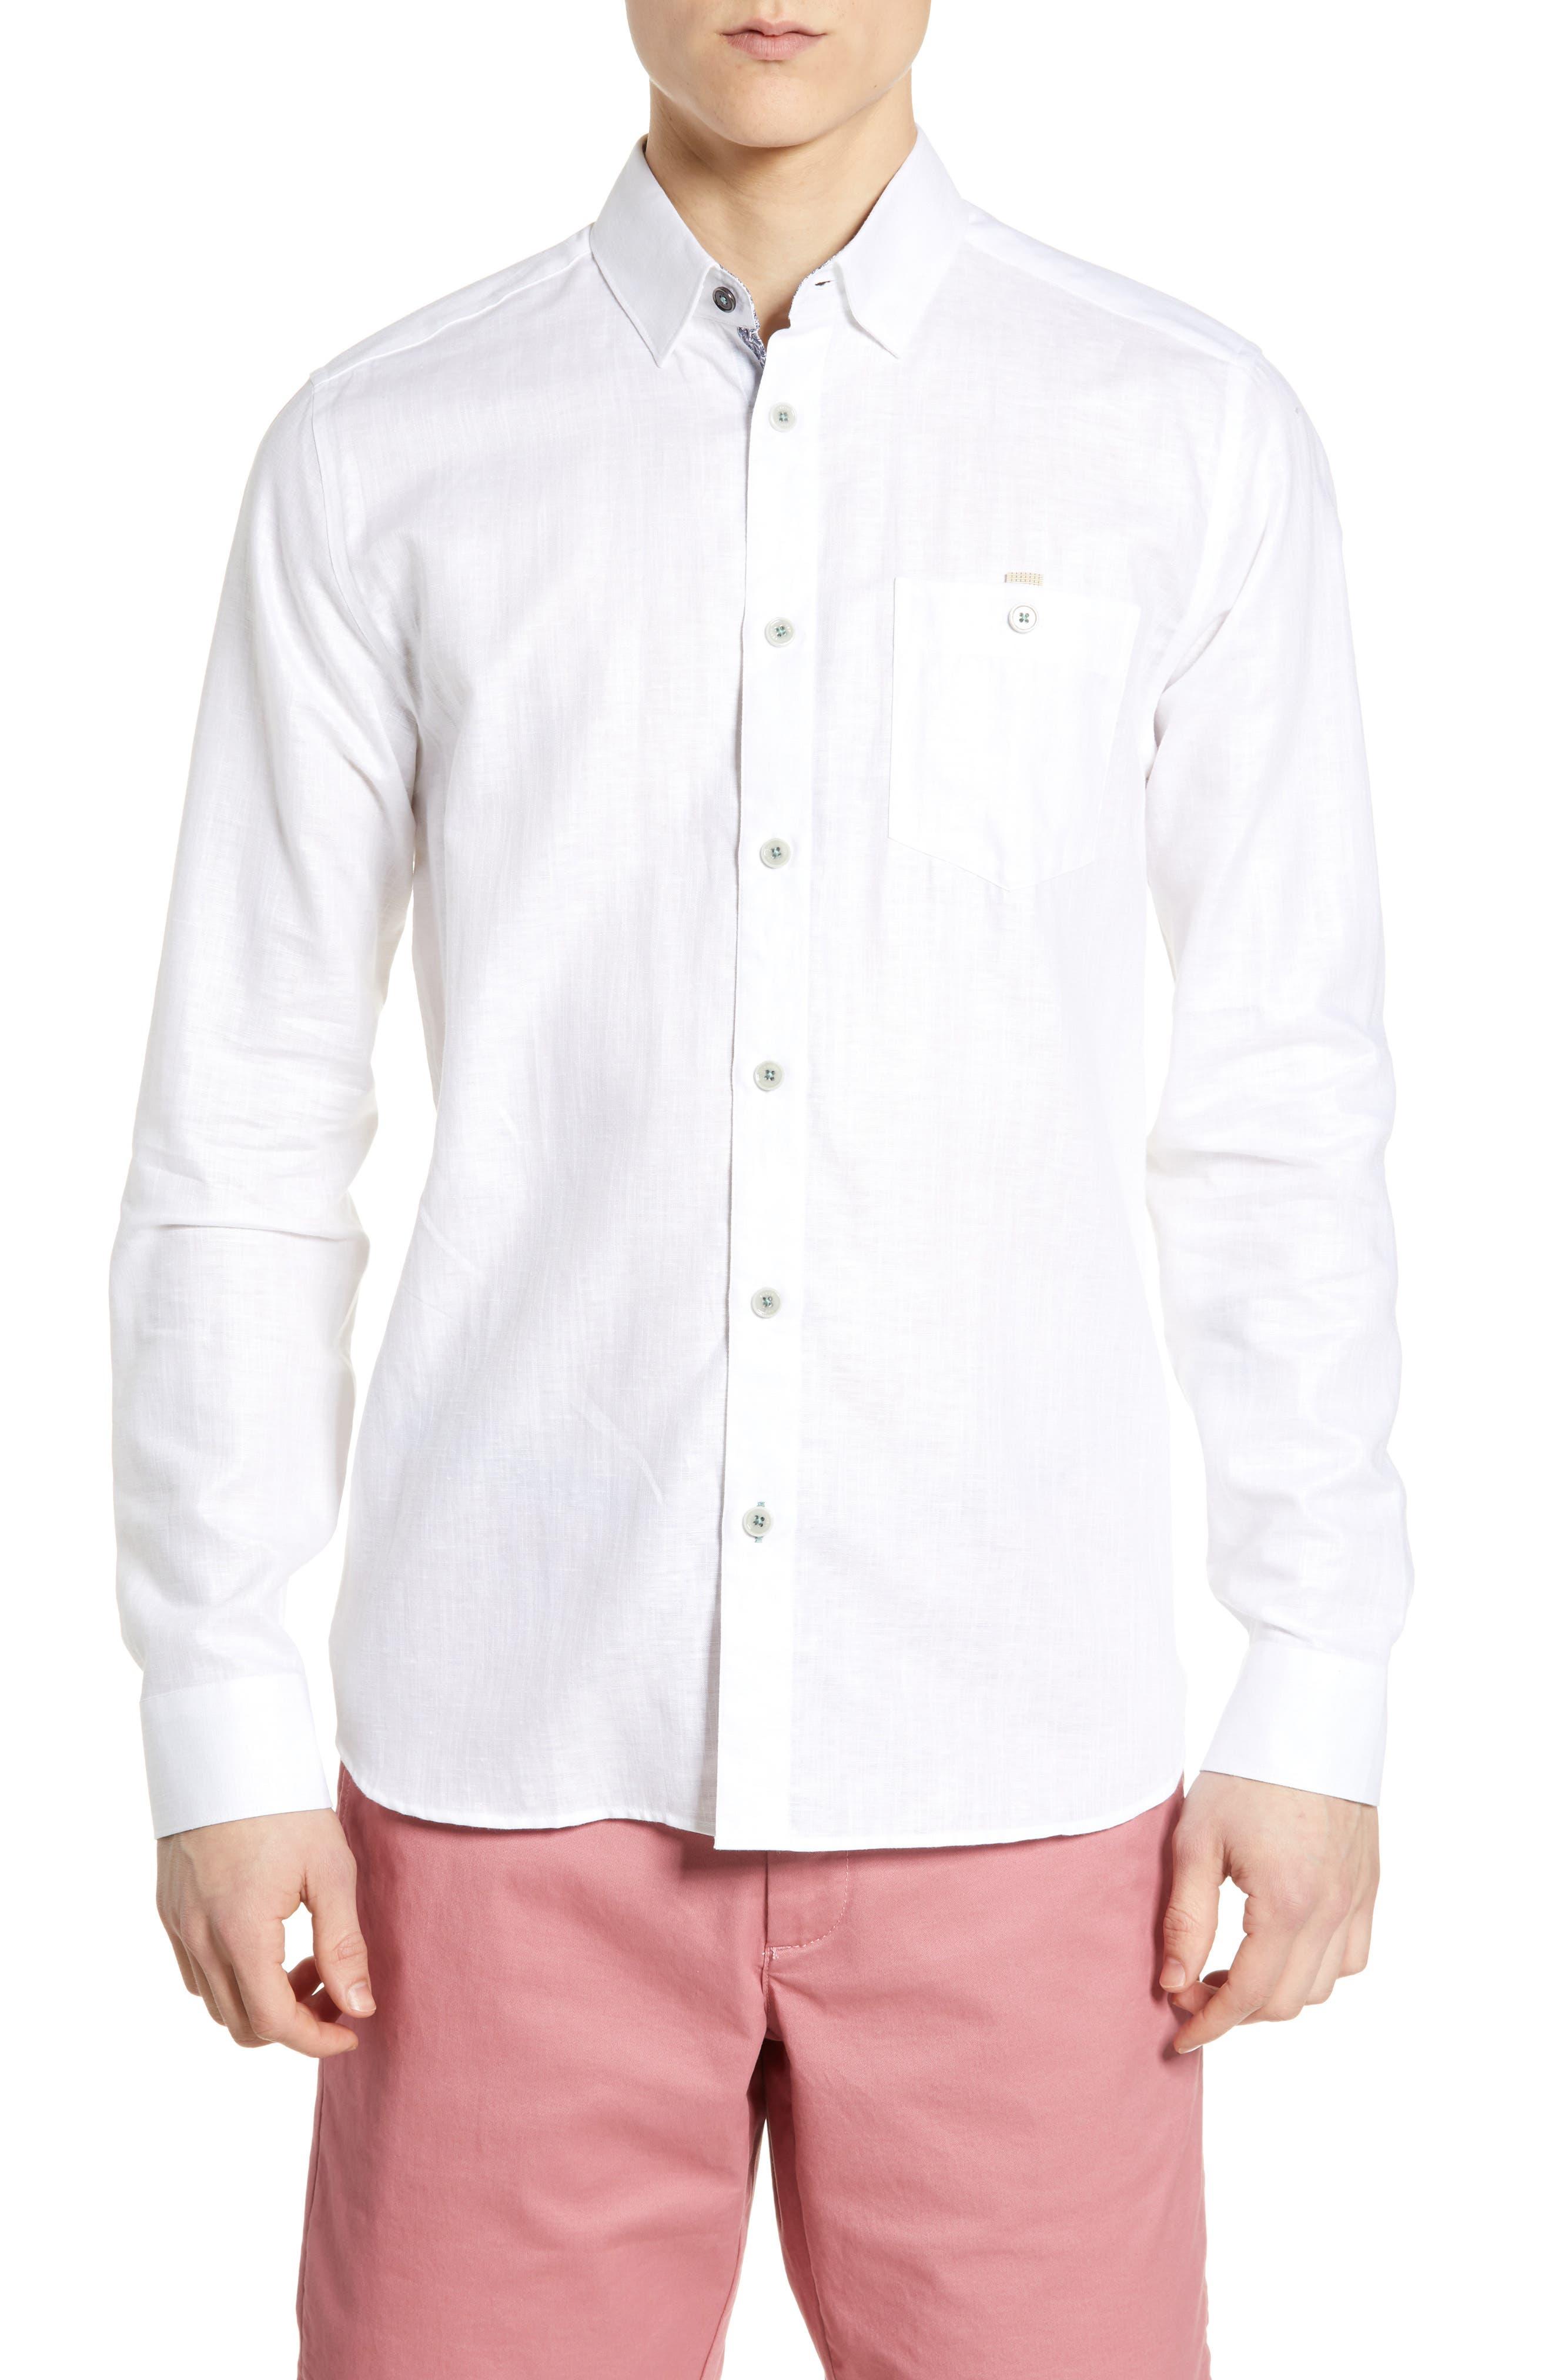 TED BAKER LONDON Emuu Slim Fit Linen Shirt, Main, color, WHITE